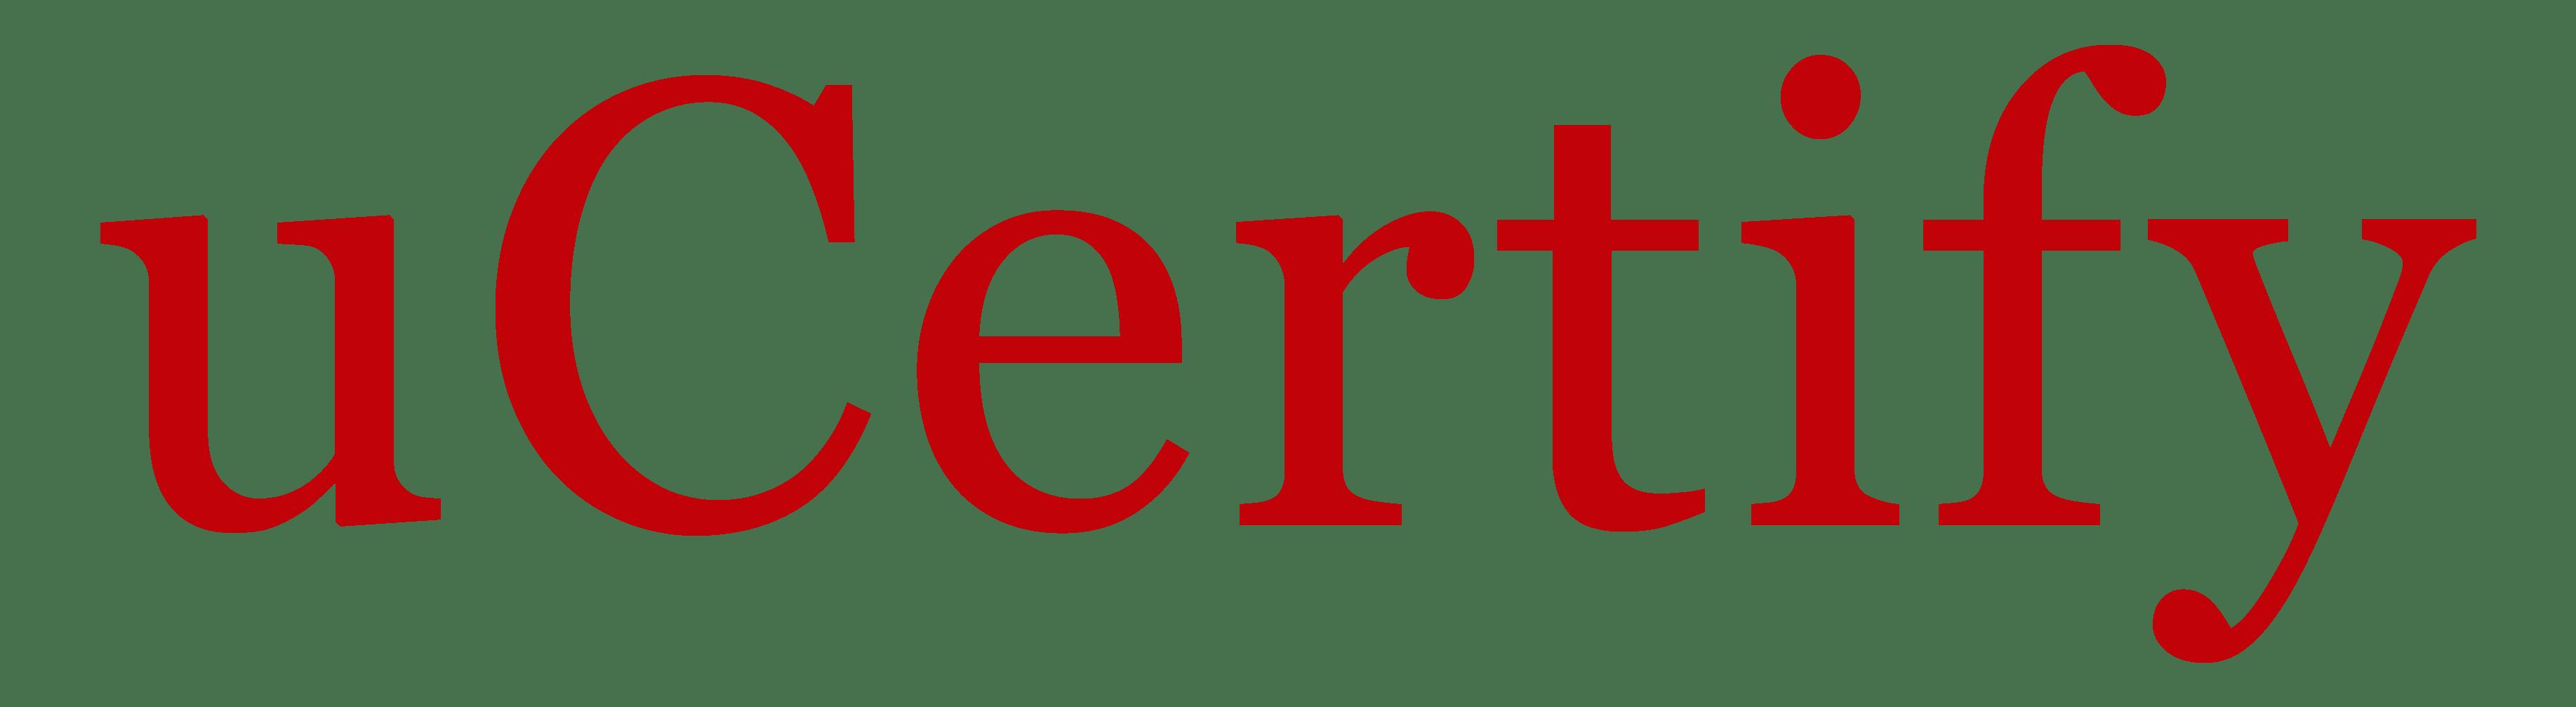 ucertify logo